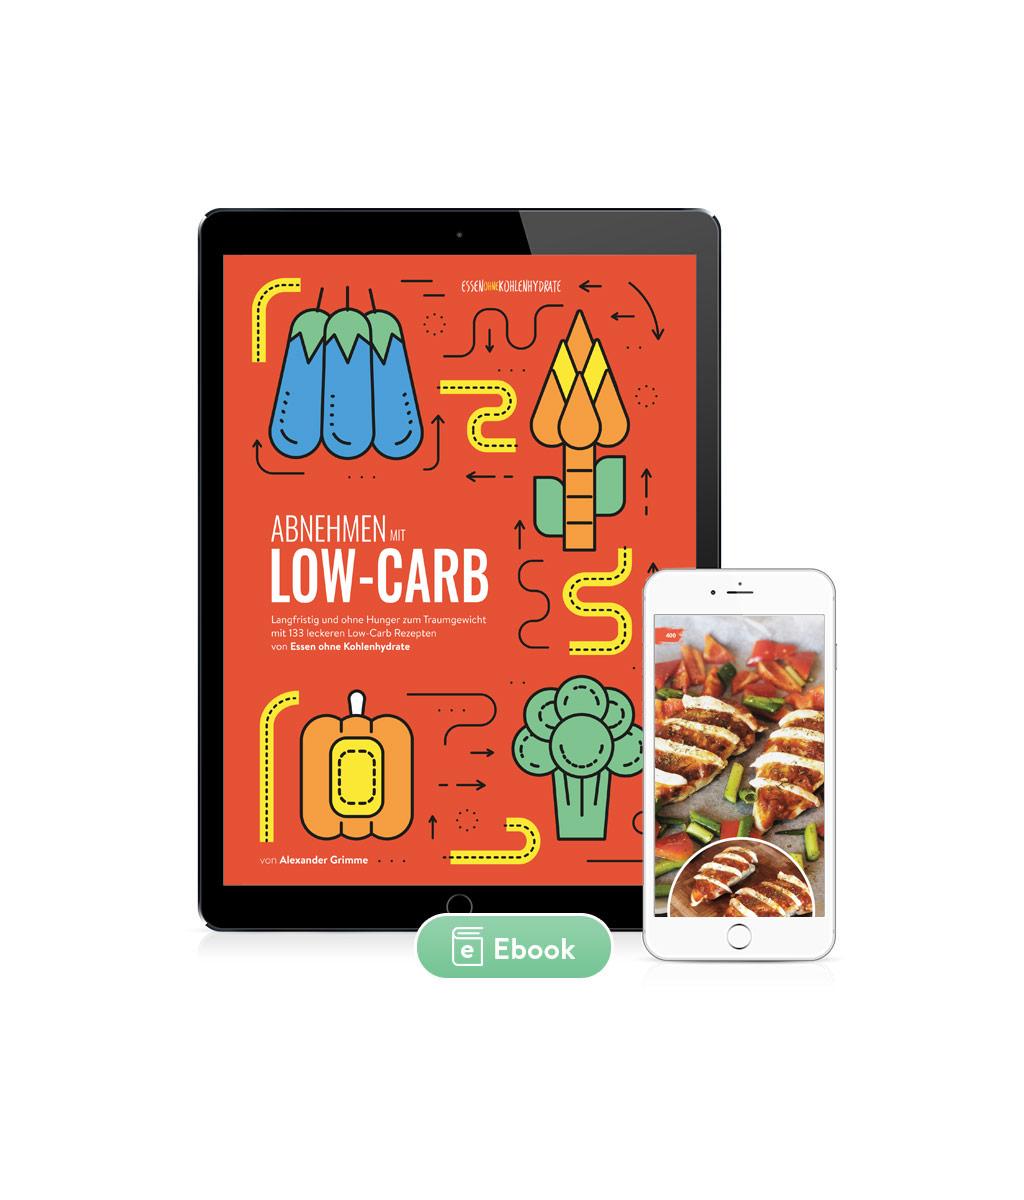 Abnehmen mit Low-Carb - Das Ebook